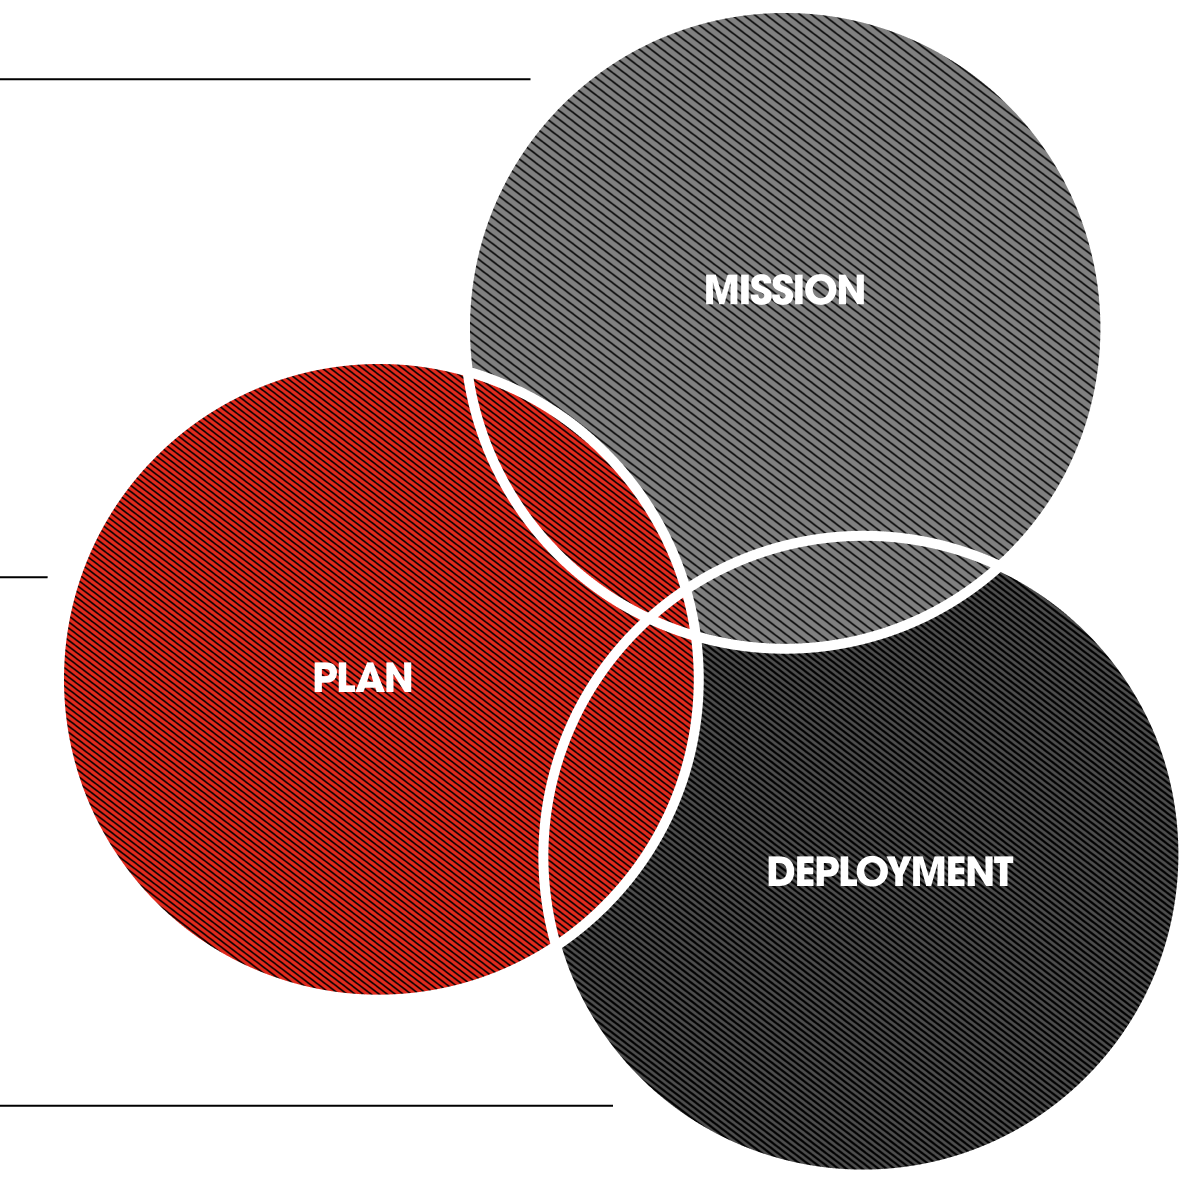 Our services, mission, plan & deployment